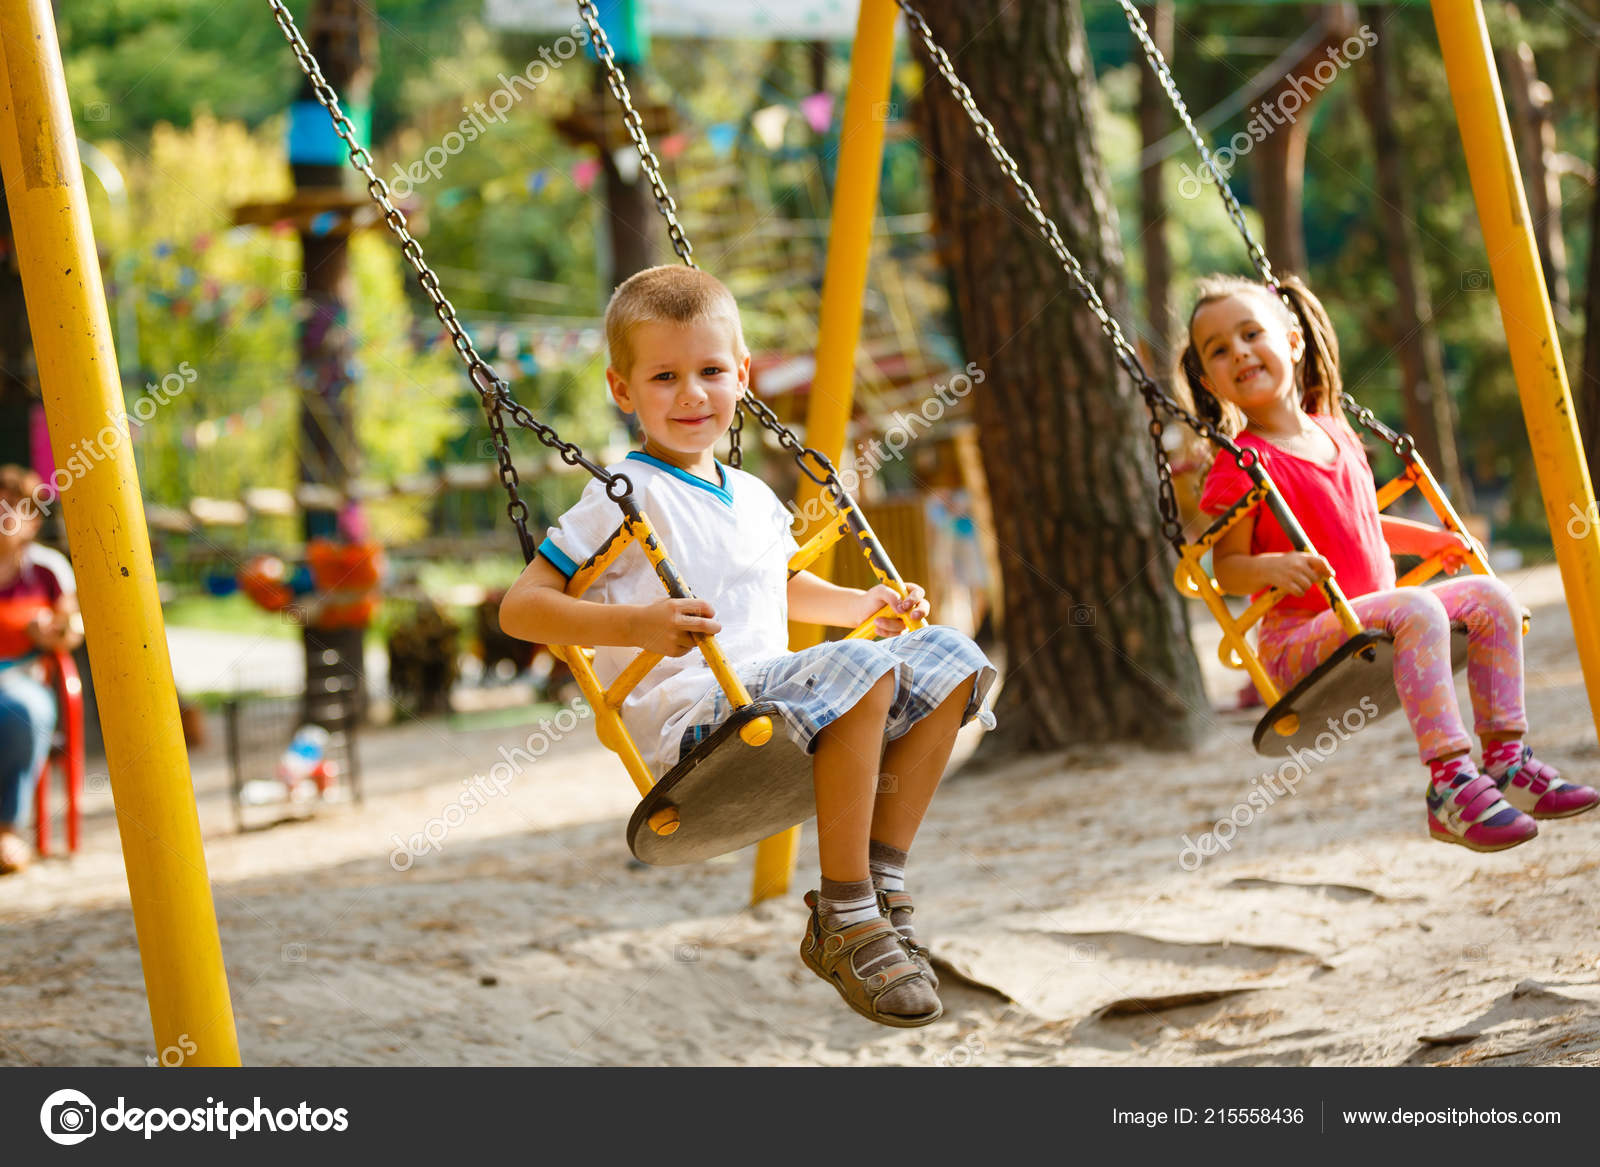 7c4277e2a9f Χαμογελώντας Μικρό Κορίτσι Και Αγόρι Μια Κούνια Παιδιά Που Παίζουν ...